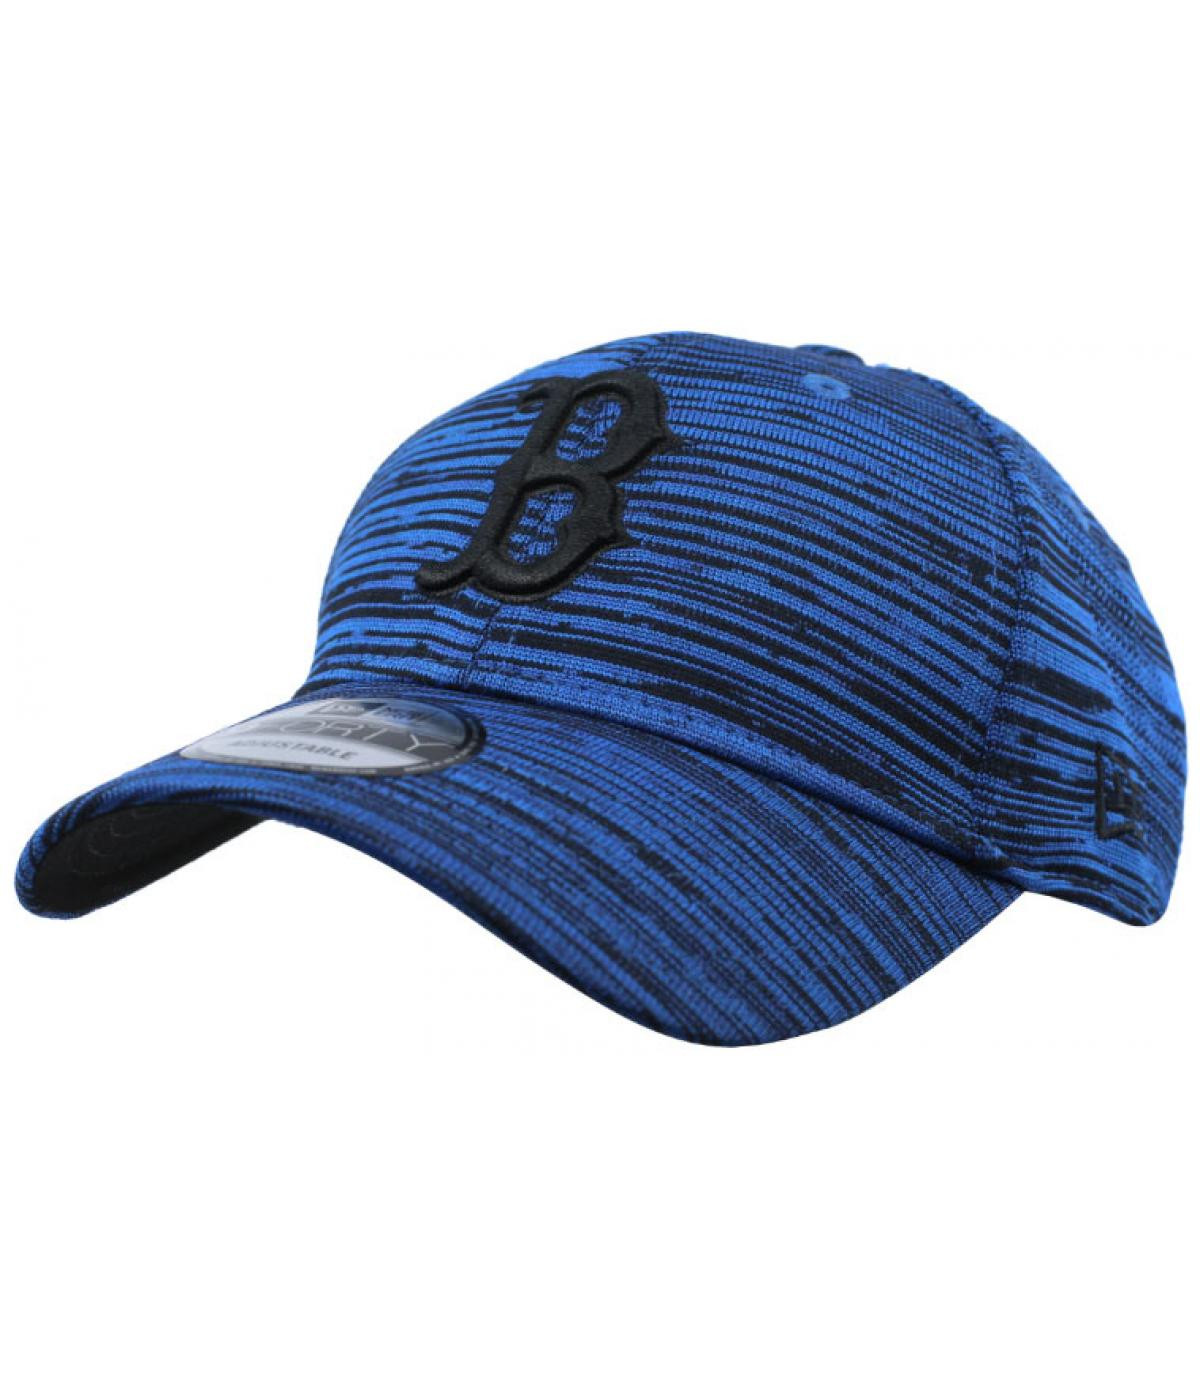 Dettagli Engineered 9Forty Boston royal black - image 2